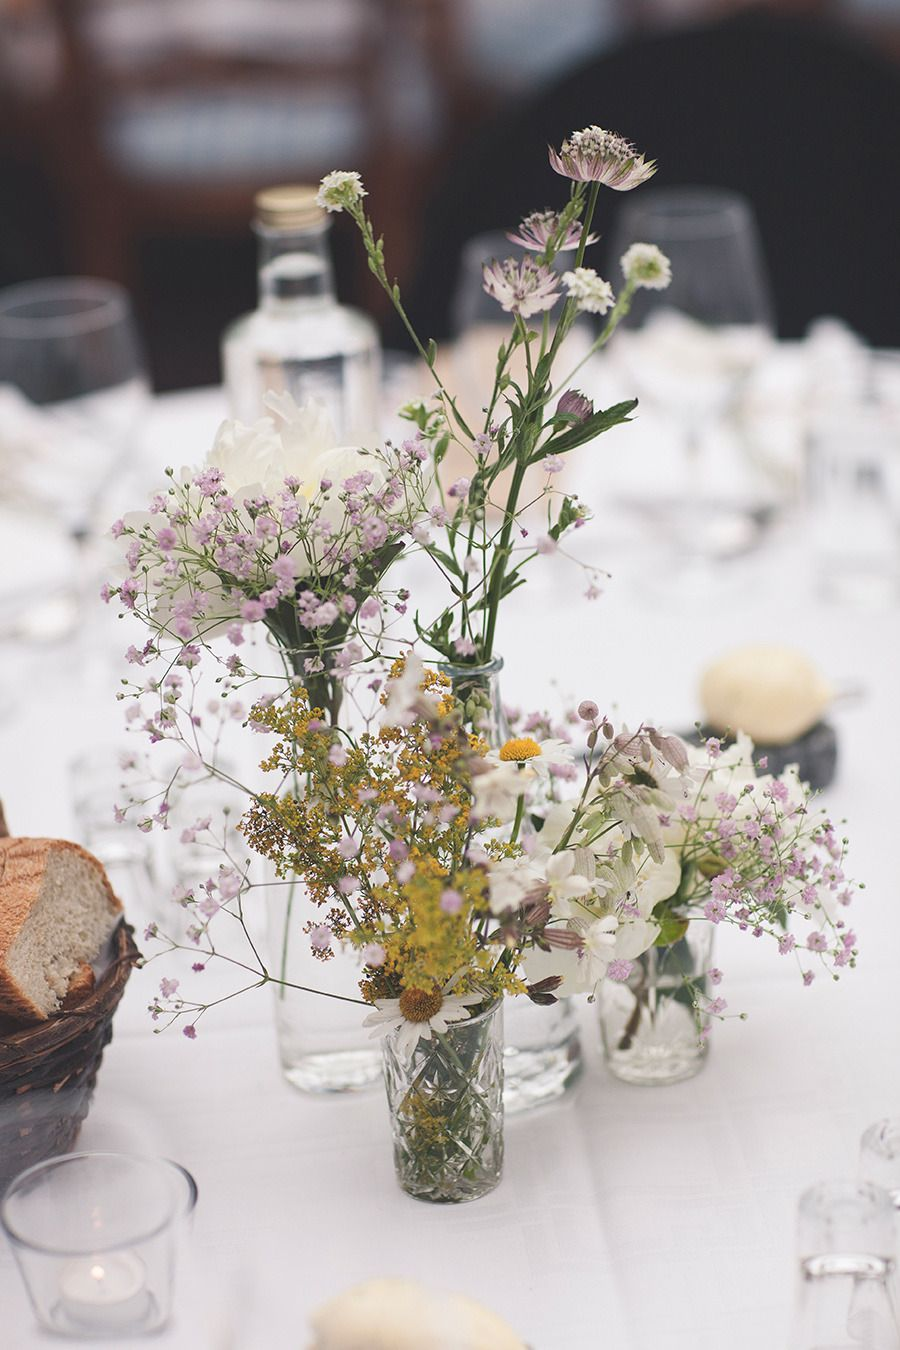 Modern Swedish Beach Wedding from Annevi Petersson